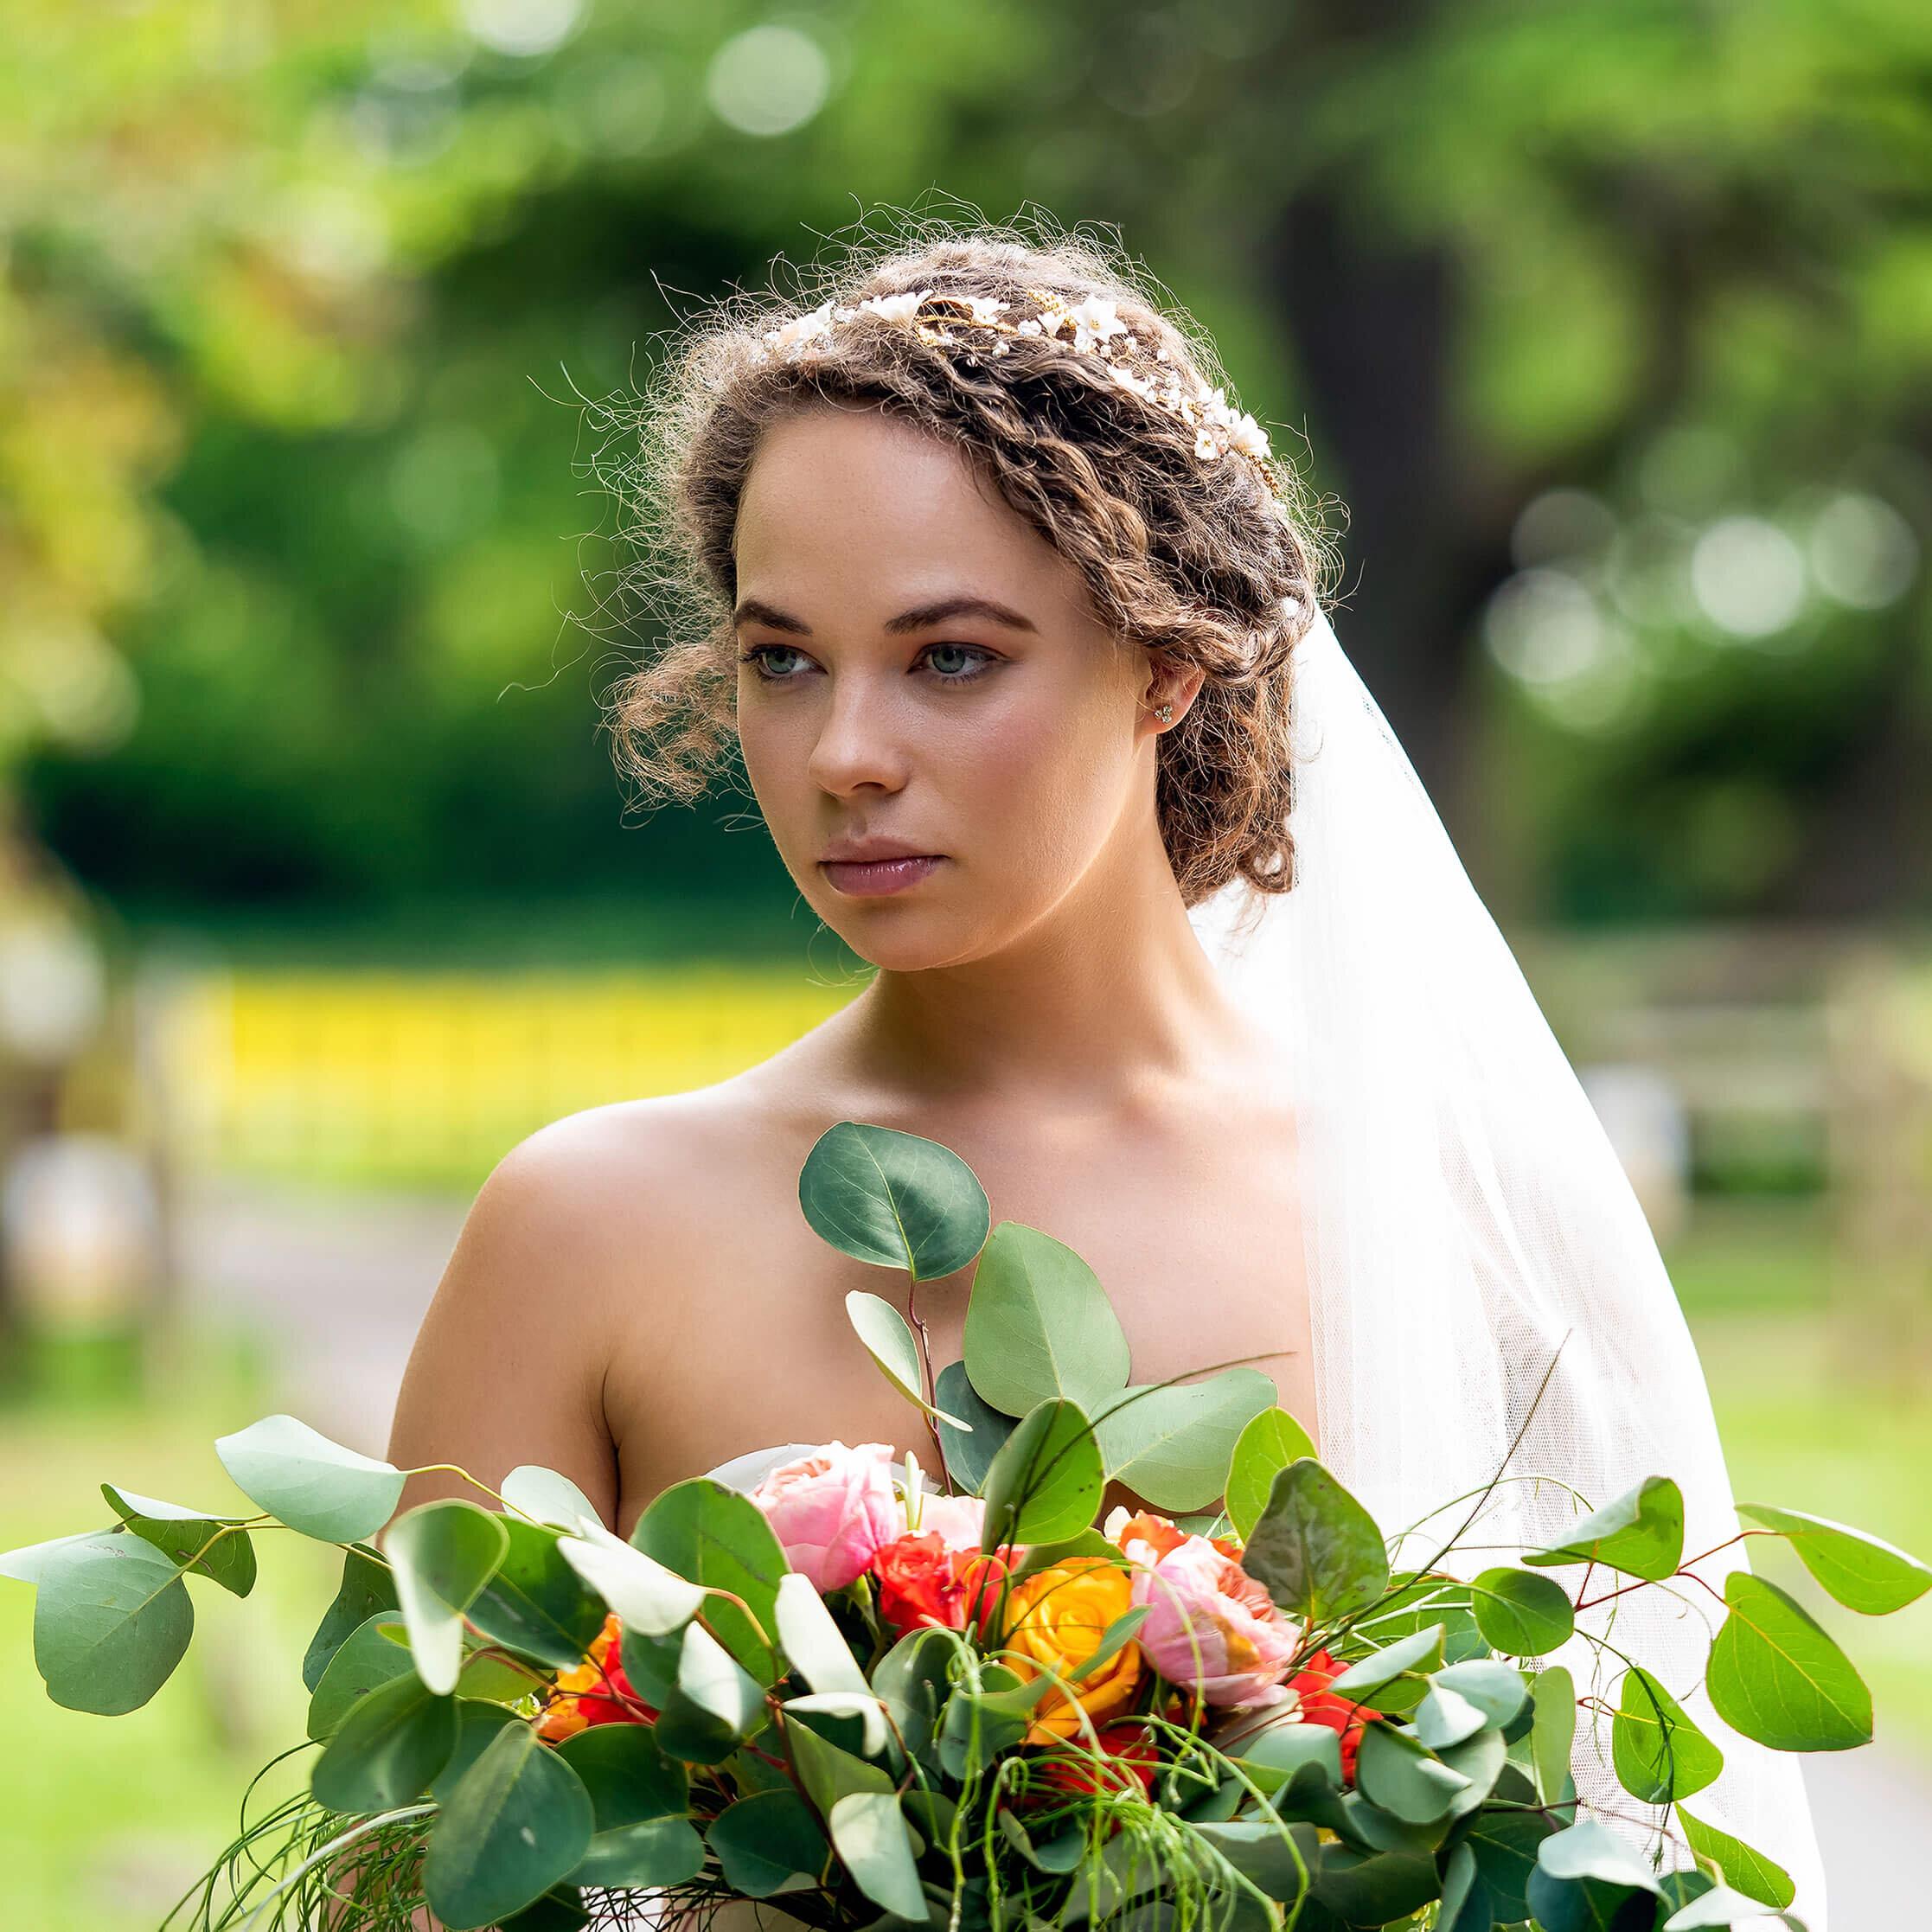 Bride with Davina Simone Weddings floral and foliage bouquet, Sash & Veil Bridal veil, and PS With Love Bridal Hair Piece, at Nurstead Court Wedding Venue, Kent.